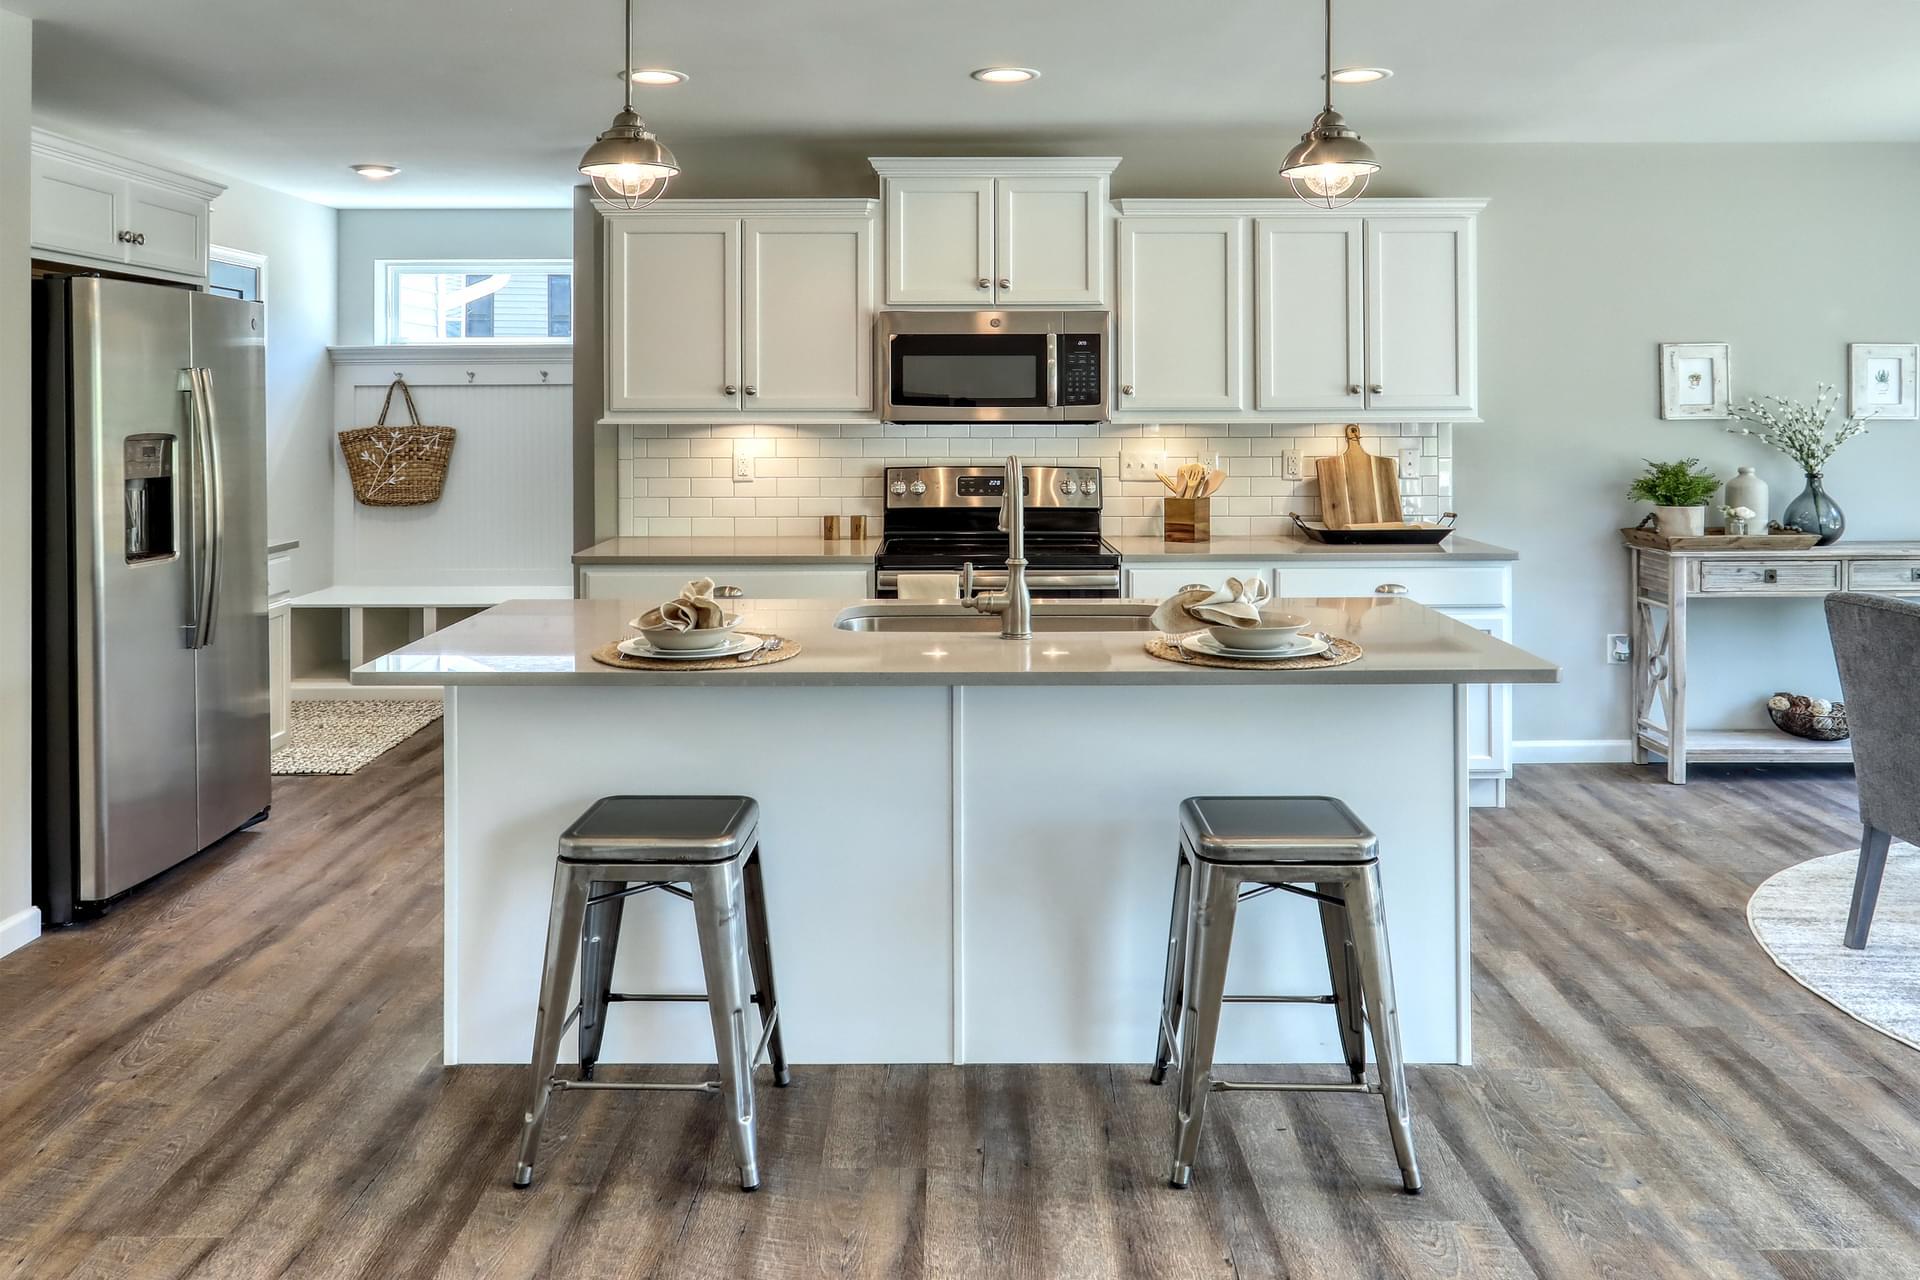 Revere New Home in Dover, PA